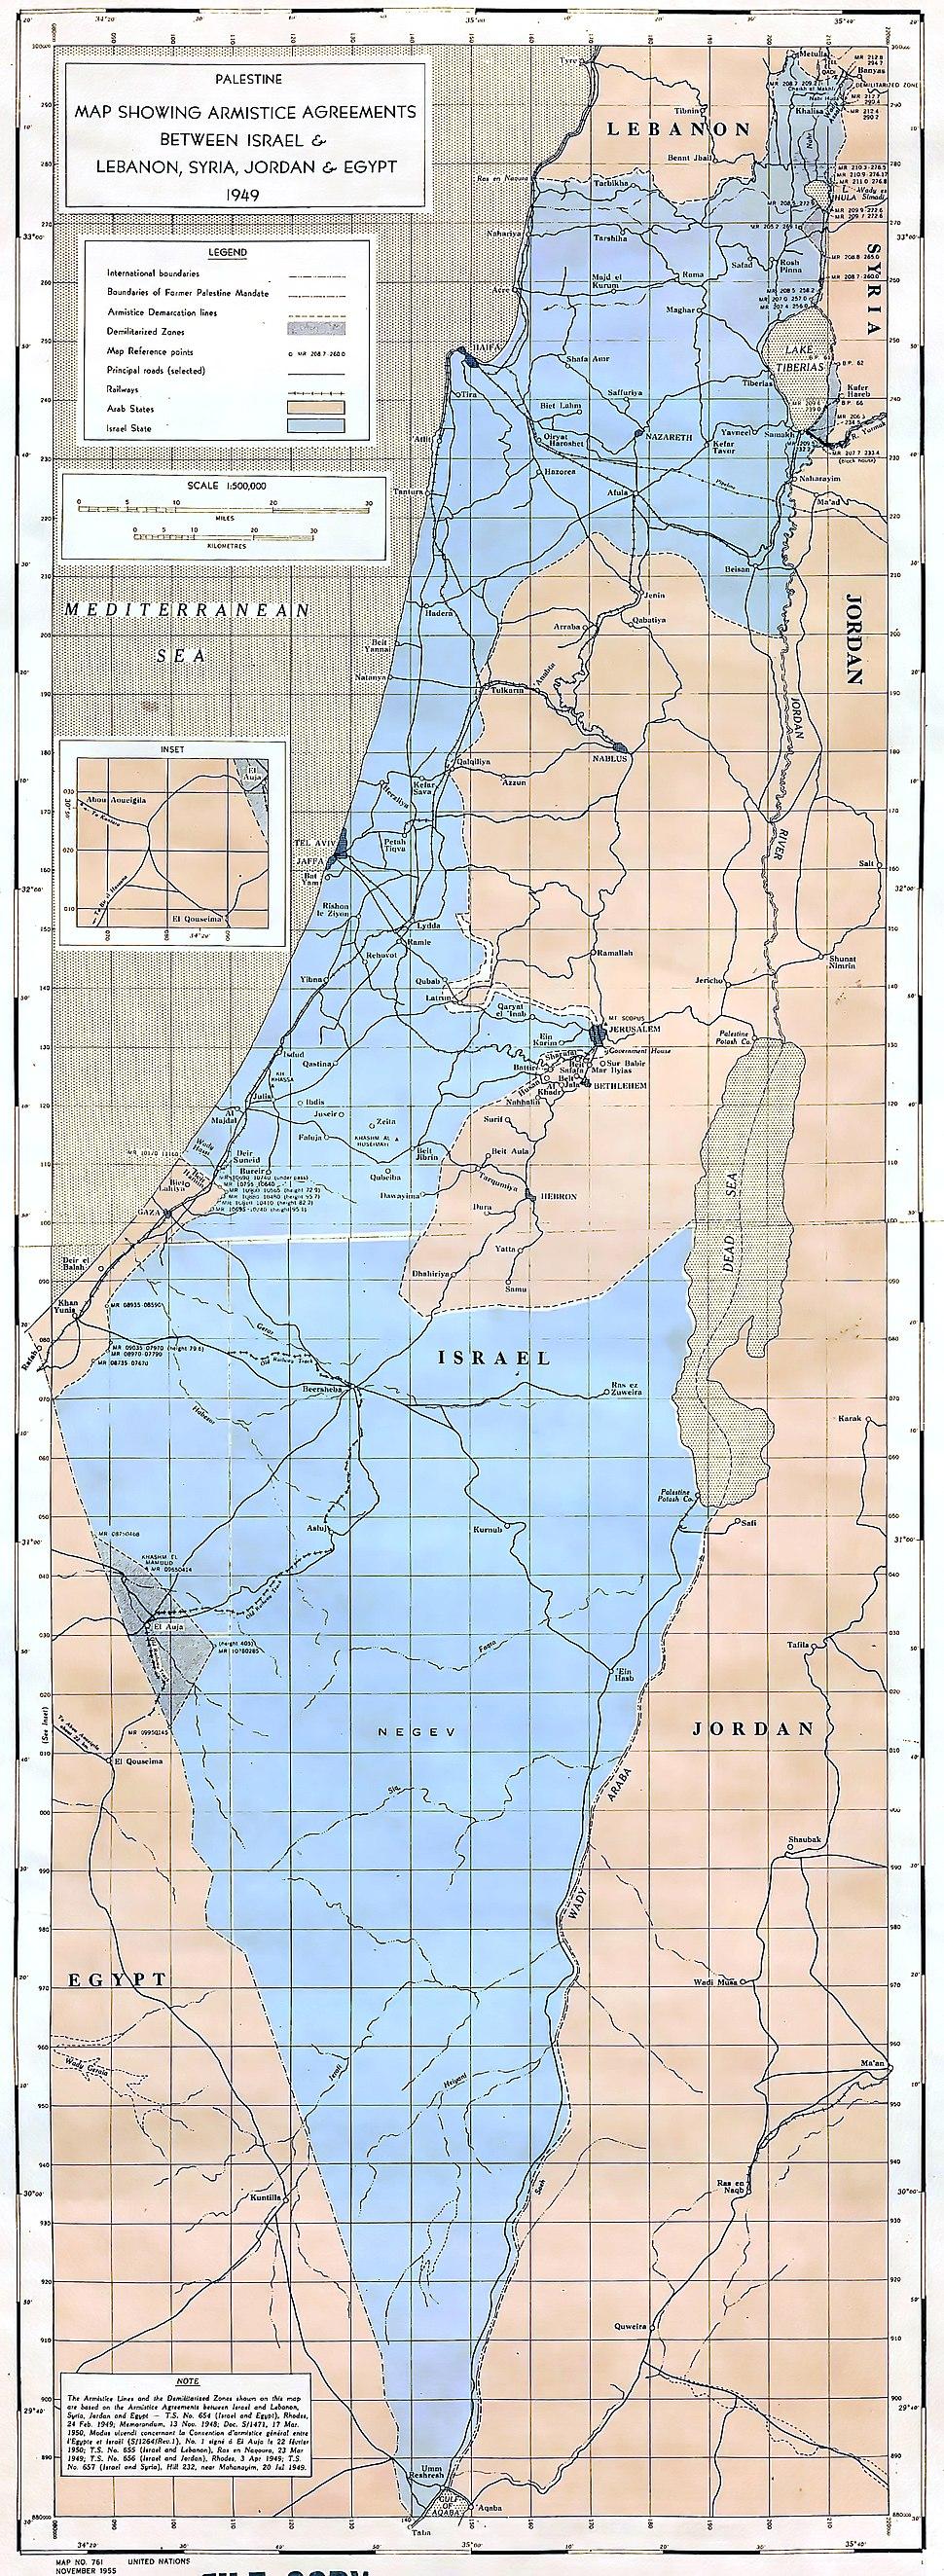 United Nations Palestine map showing Armistice Agreements between Israel & Lebanon, Syria, Jordan & Egypt 1949-1950